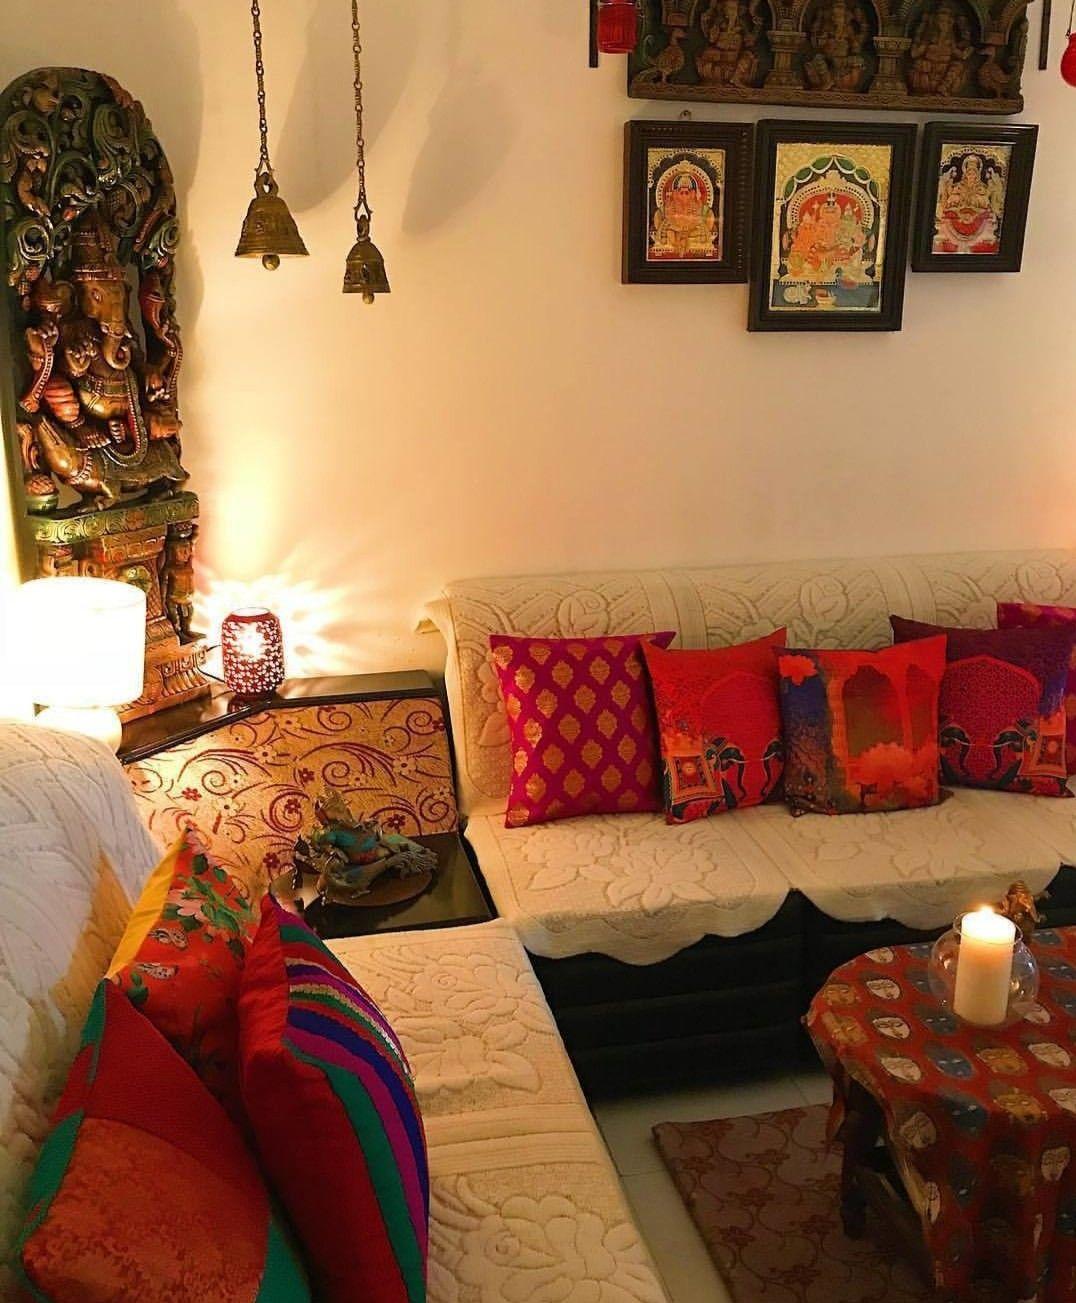 Saved by radhareddy garisa indian room decor asian living rooms interior also bedroomdesignsindia modern bedroom design in pinterest rh